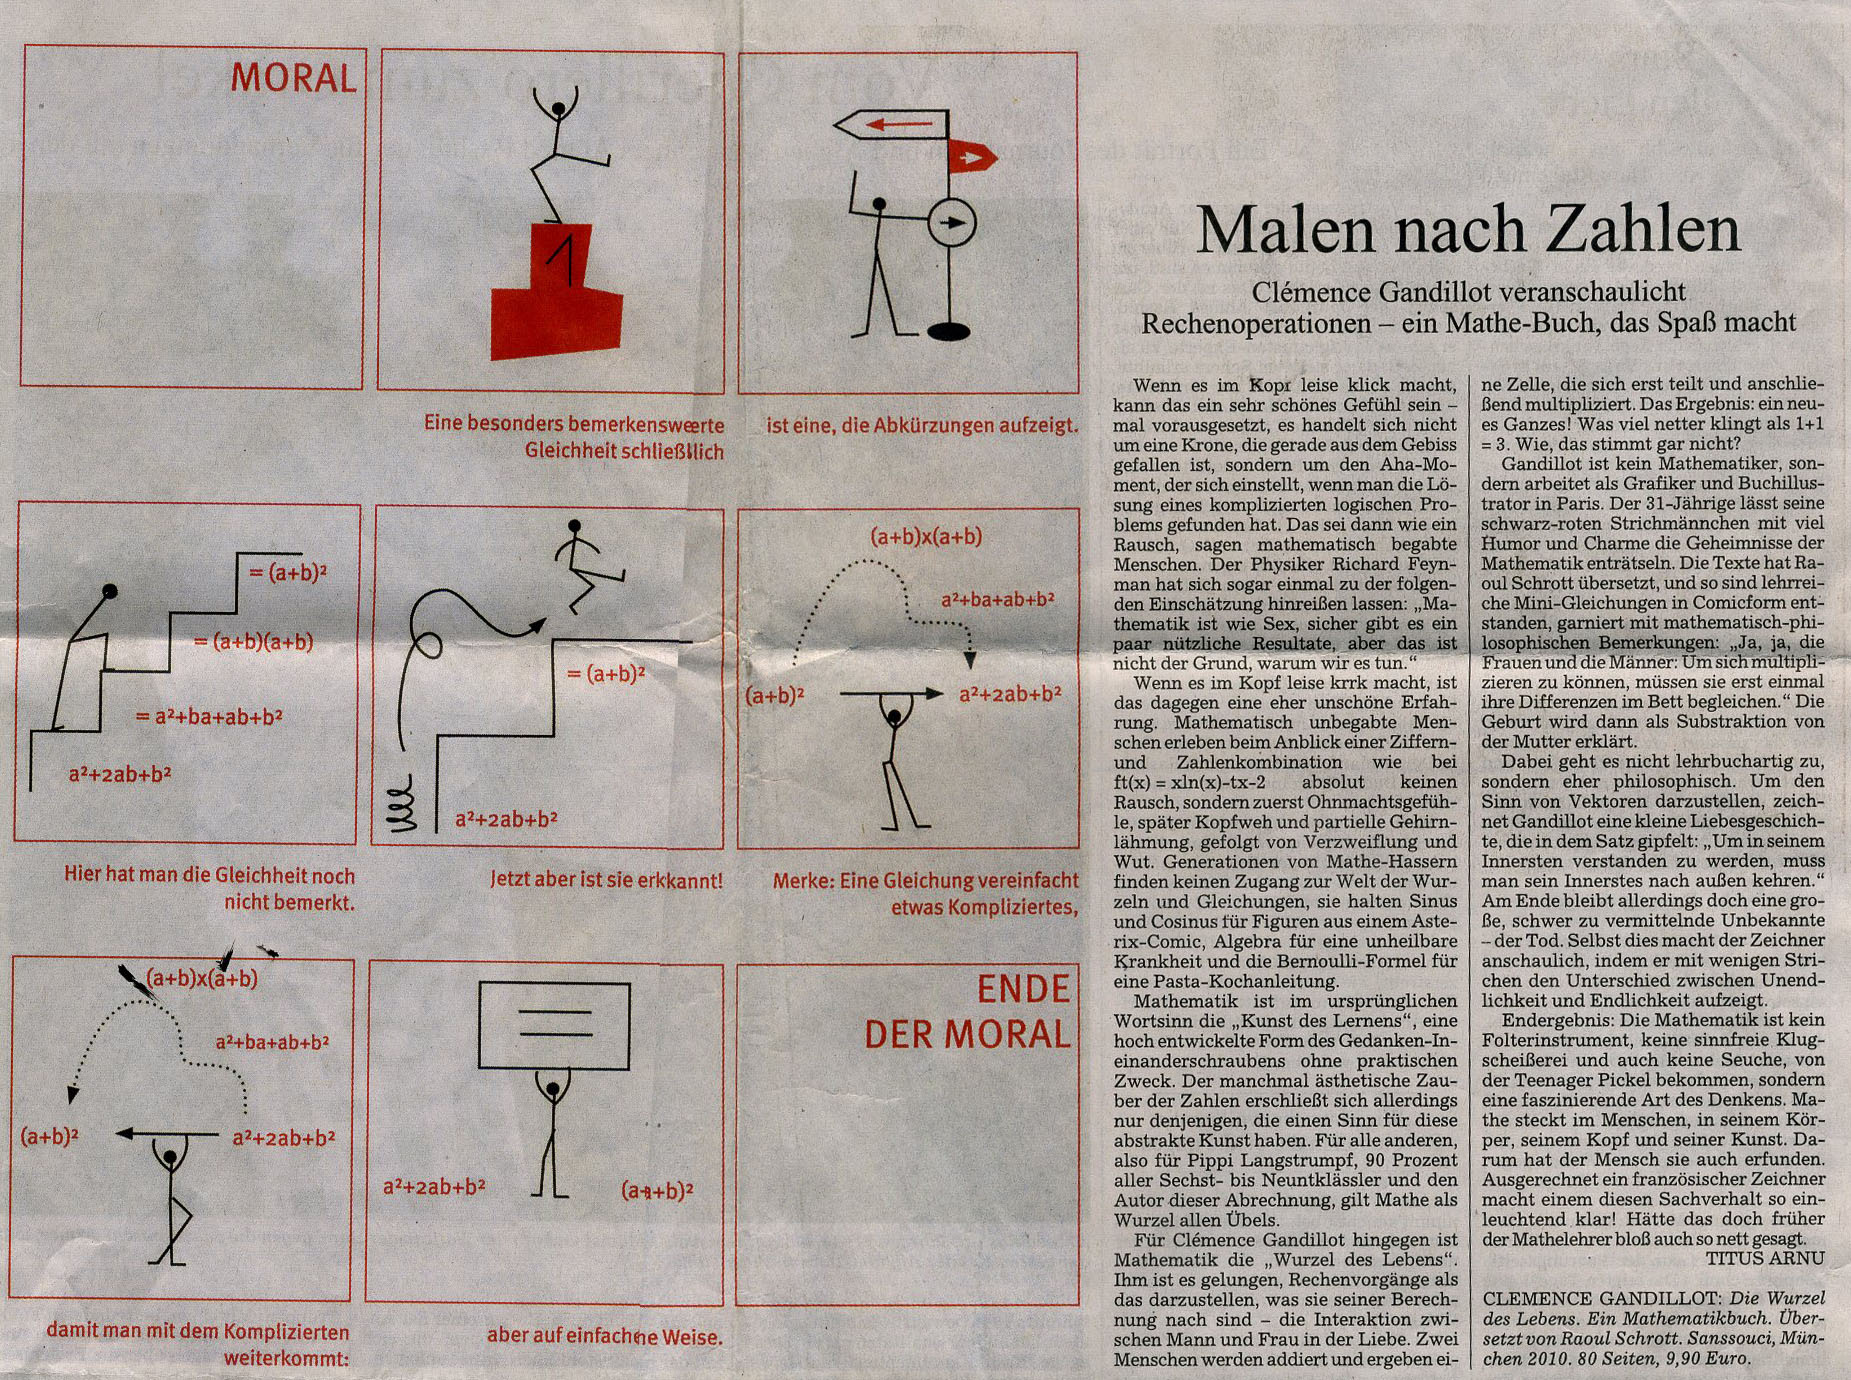 2010_09_17_Süddeutsche Zeitung_Clemence Gandillot coupe